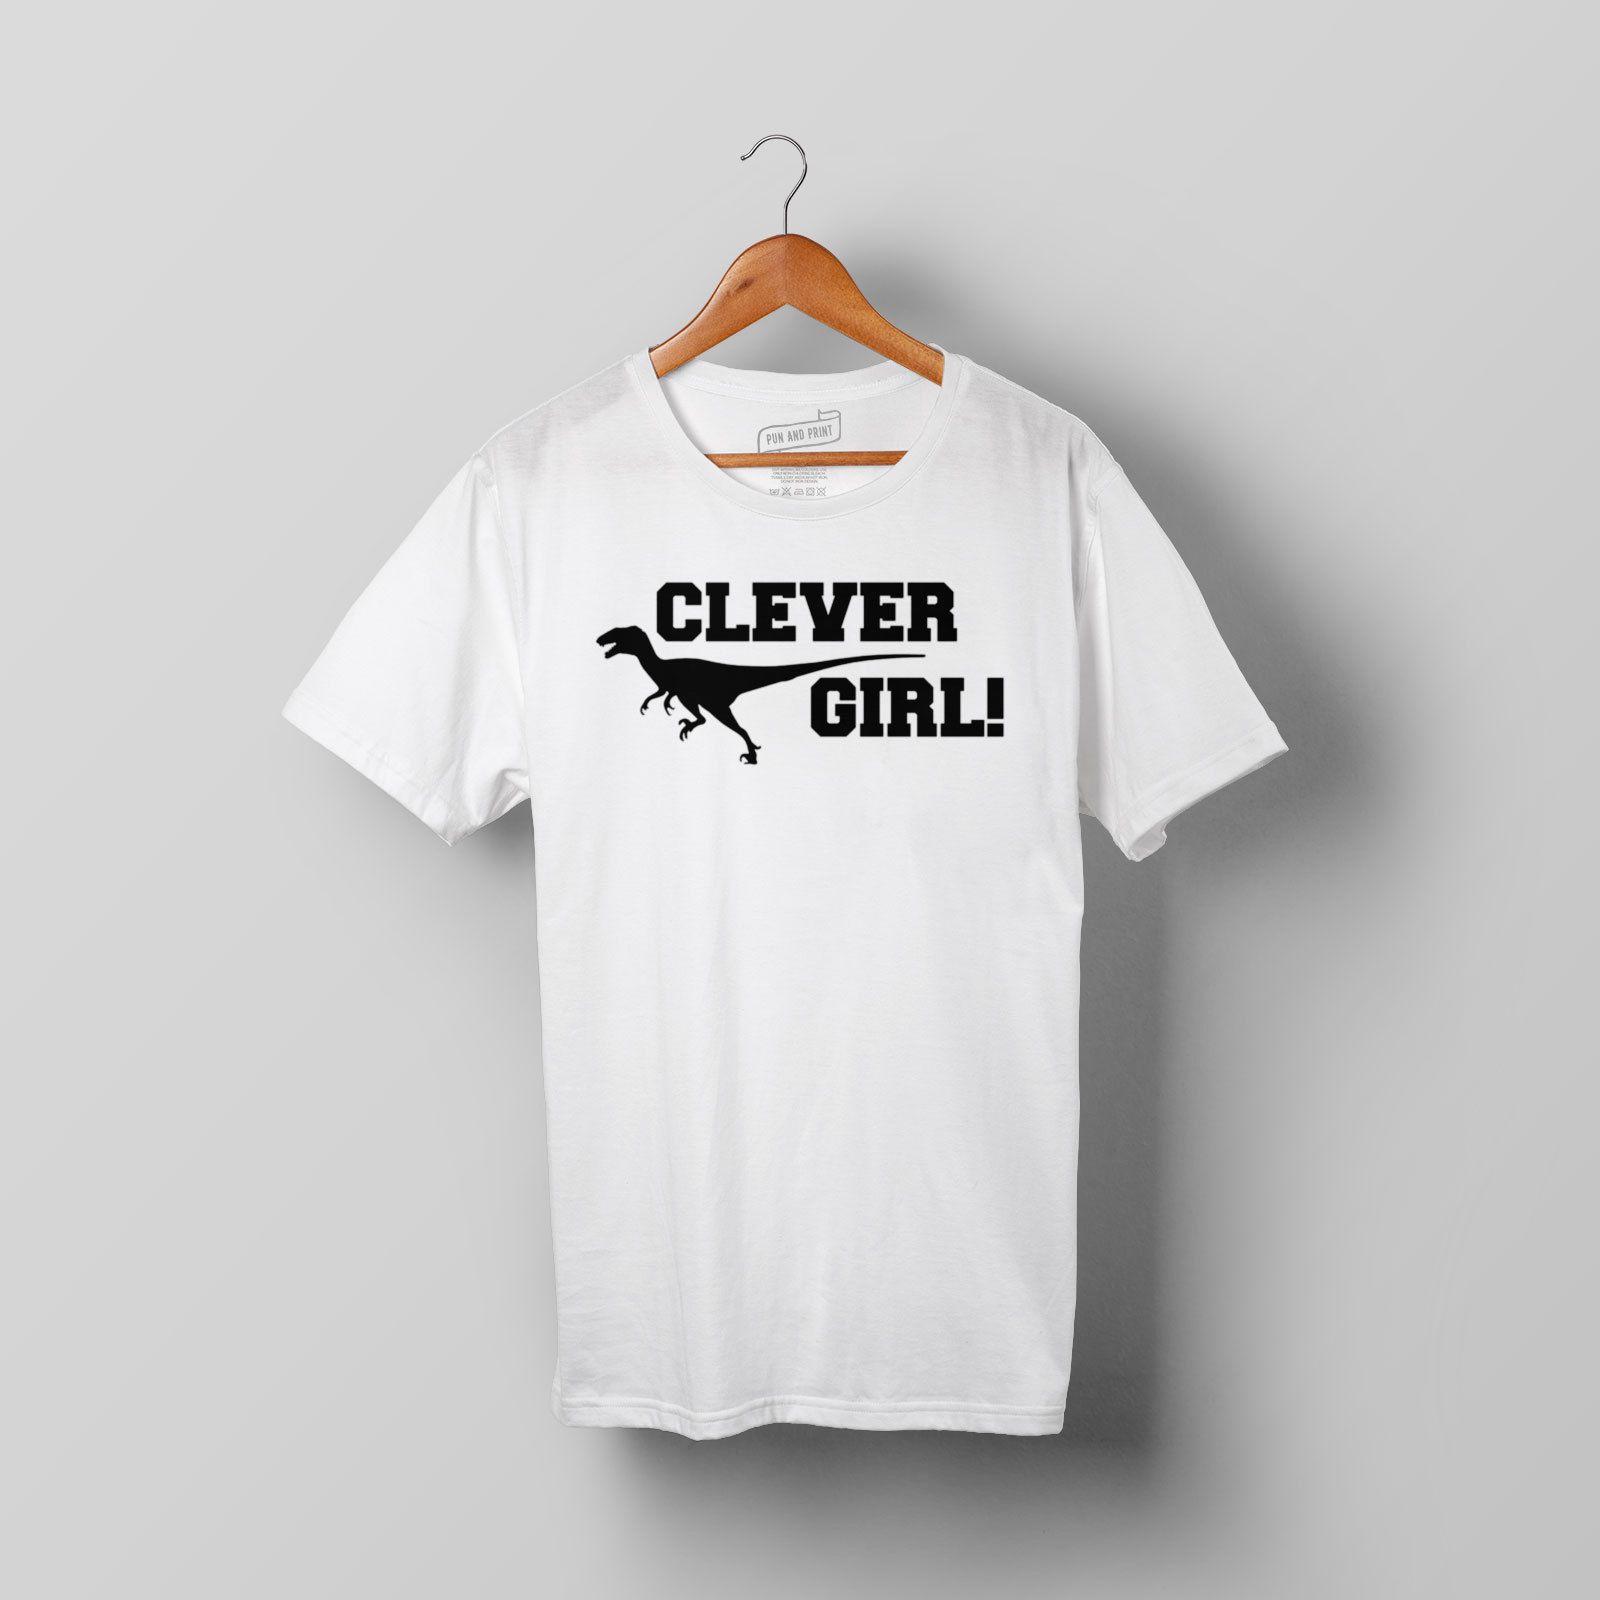 31817c622 Jurassic Park T Shirt Clever Girl! Dinosaur, Raptor, T Rex Cotton Tshirt Tee  T Good T Shirt Design From Beidhgate07, $11.01  DHgate.Com